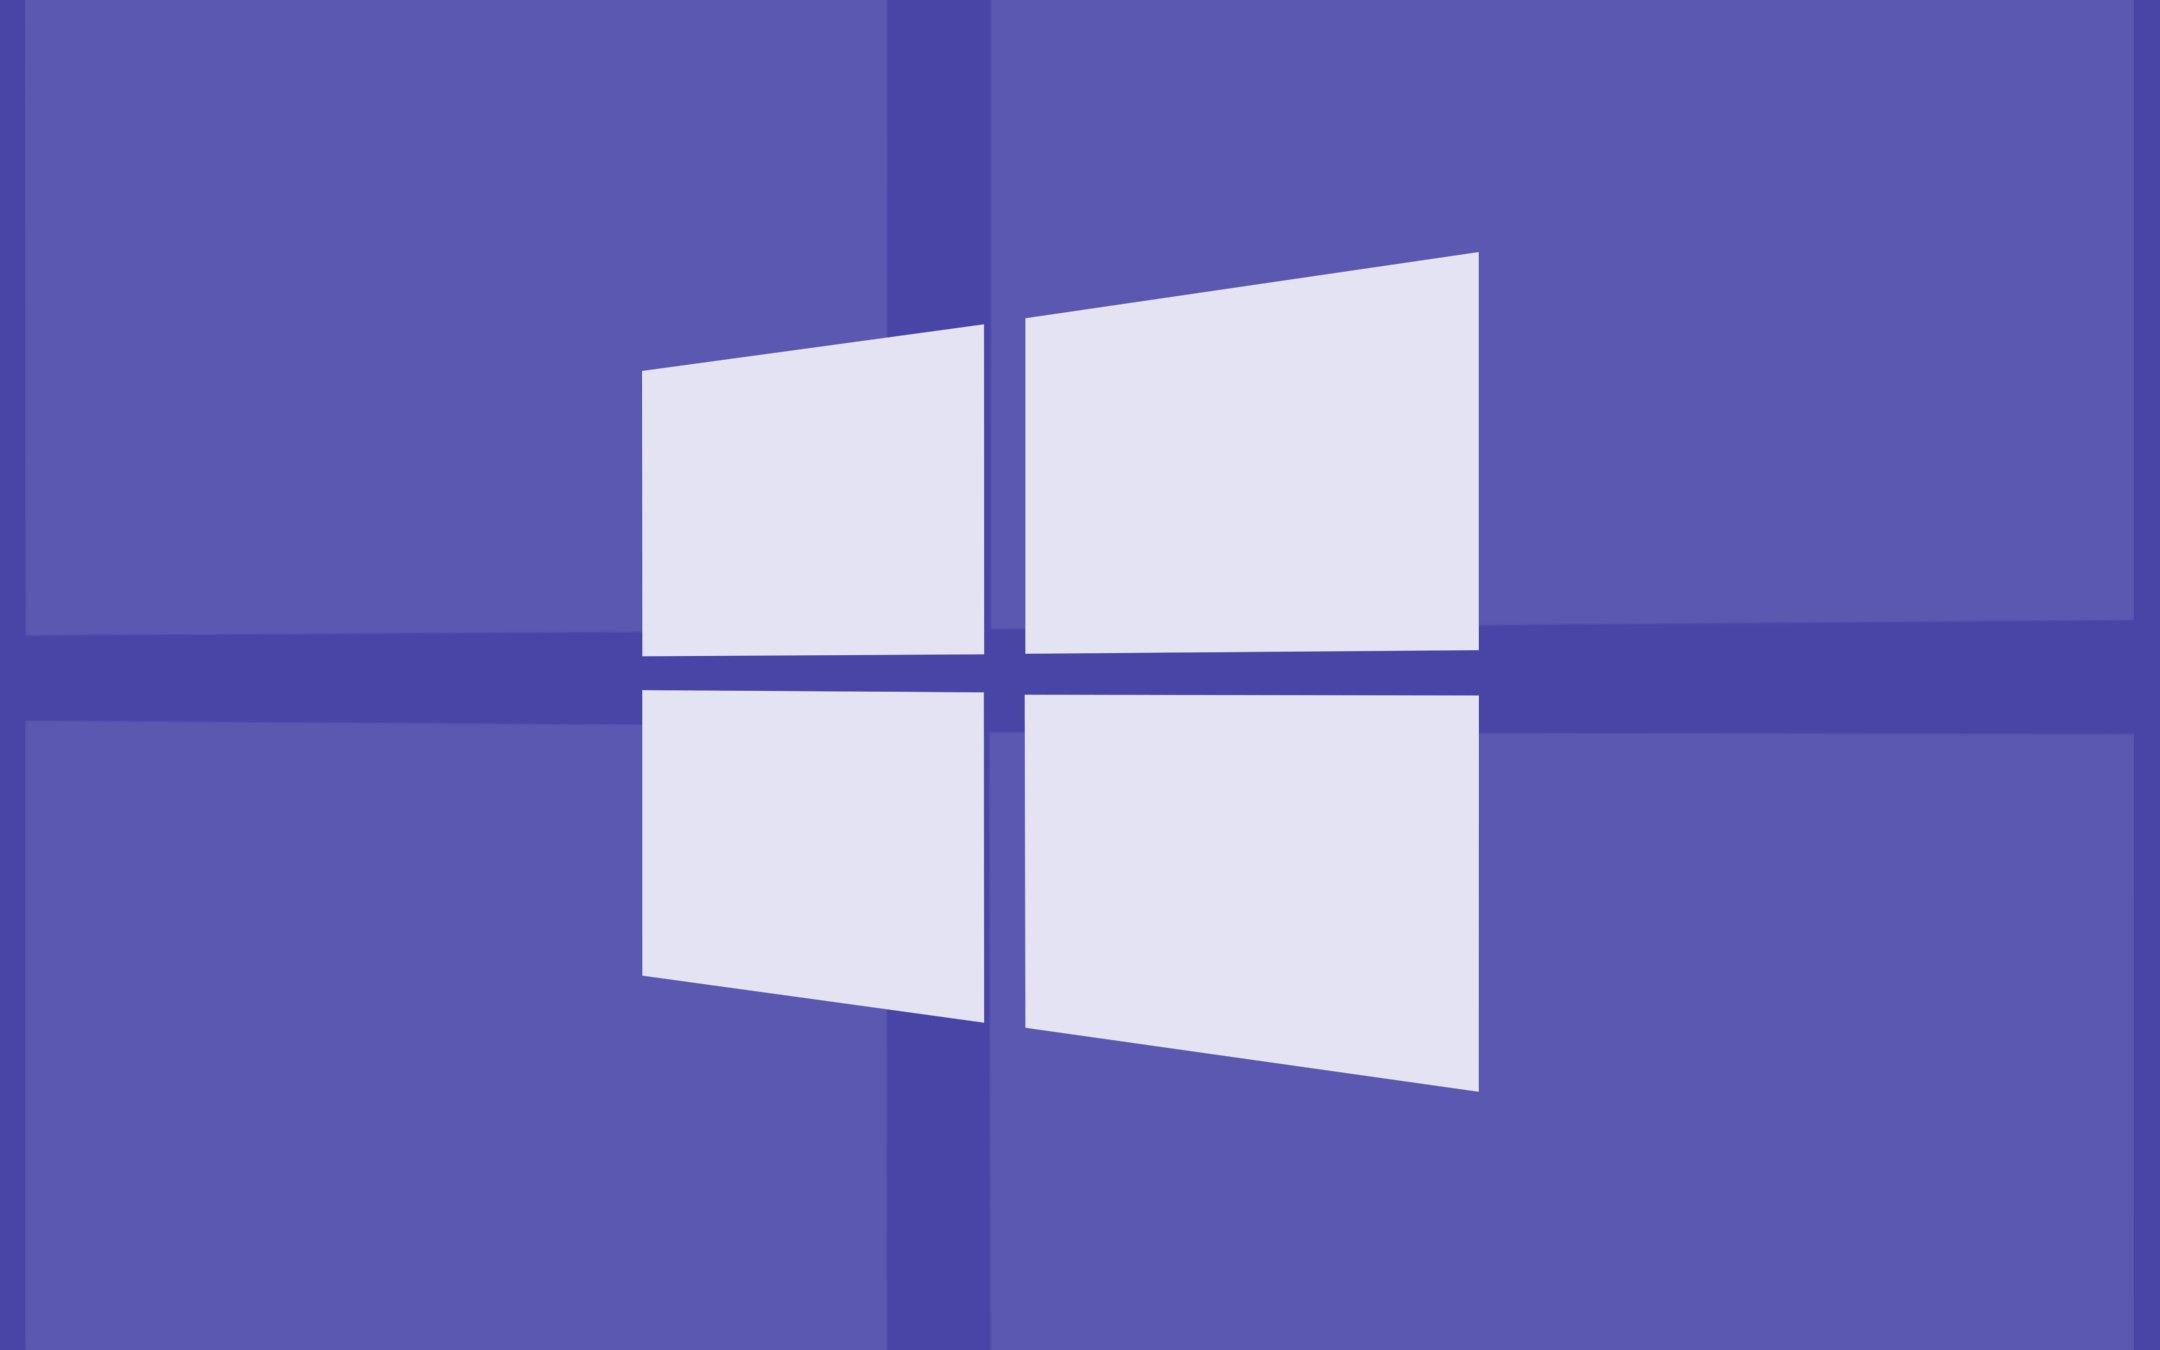 windows 10 - Windows 10 Sun Valley τι φέρνει η επερχόμενη έκδοση